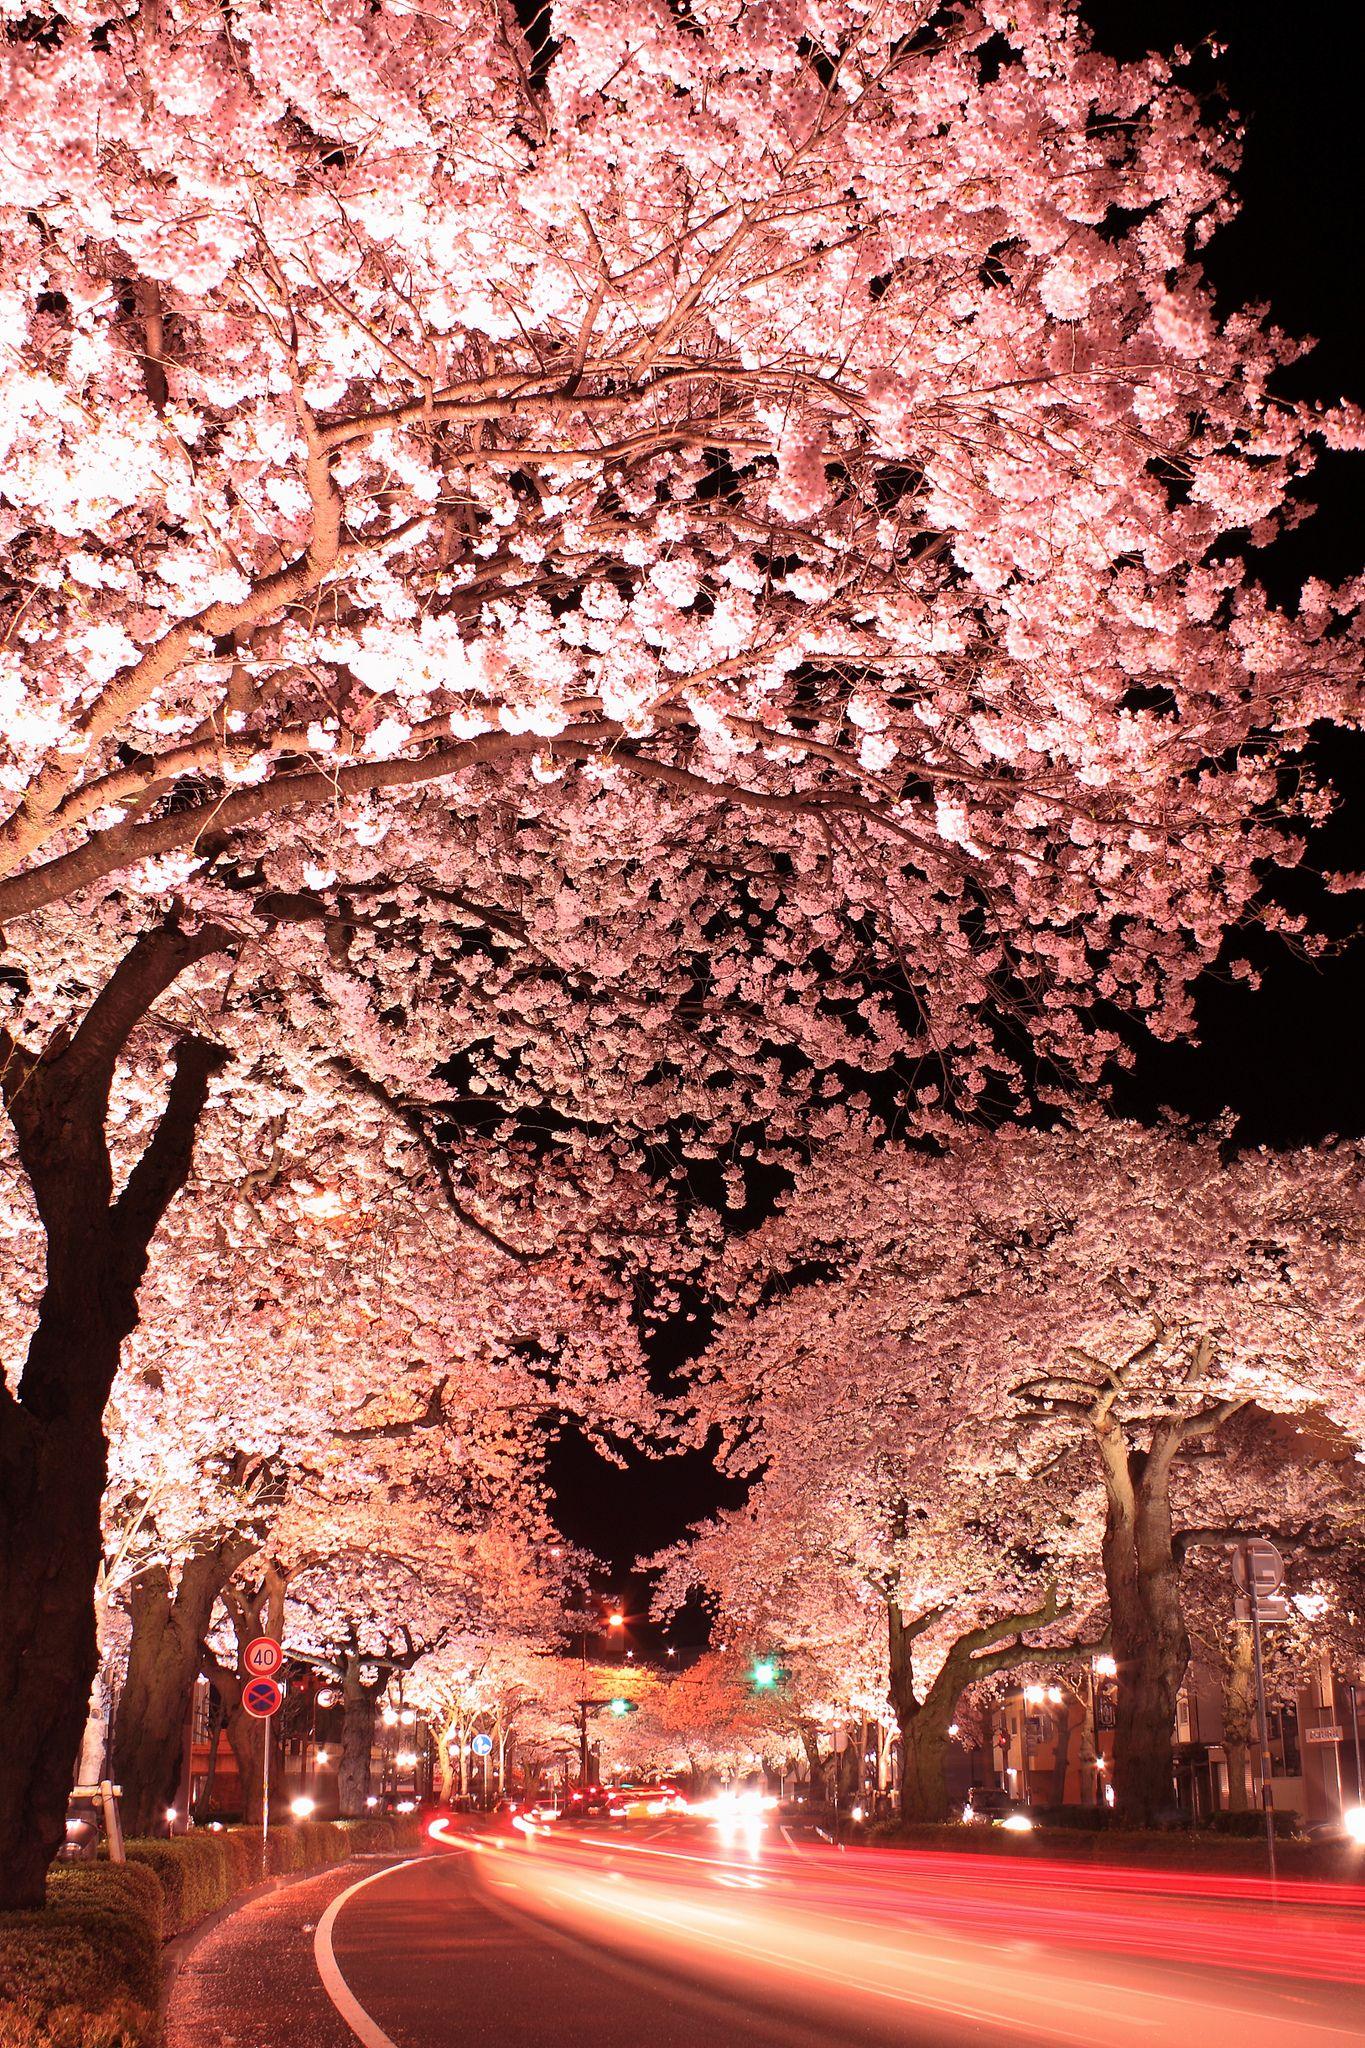 Night In Cherry Blossom Hitachi Ibaraki Japan Japanese Cherry Blossom Nature Beautiful Nature